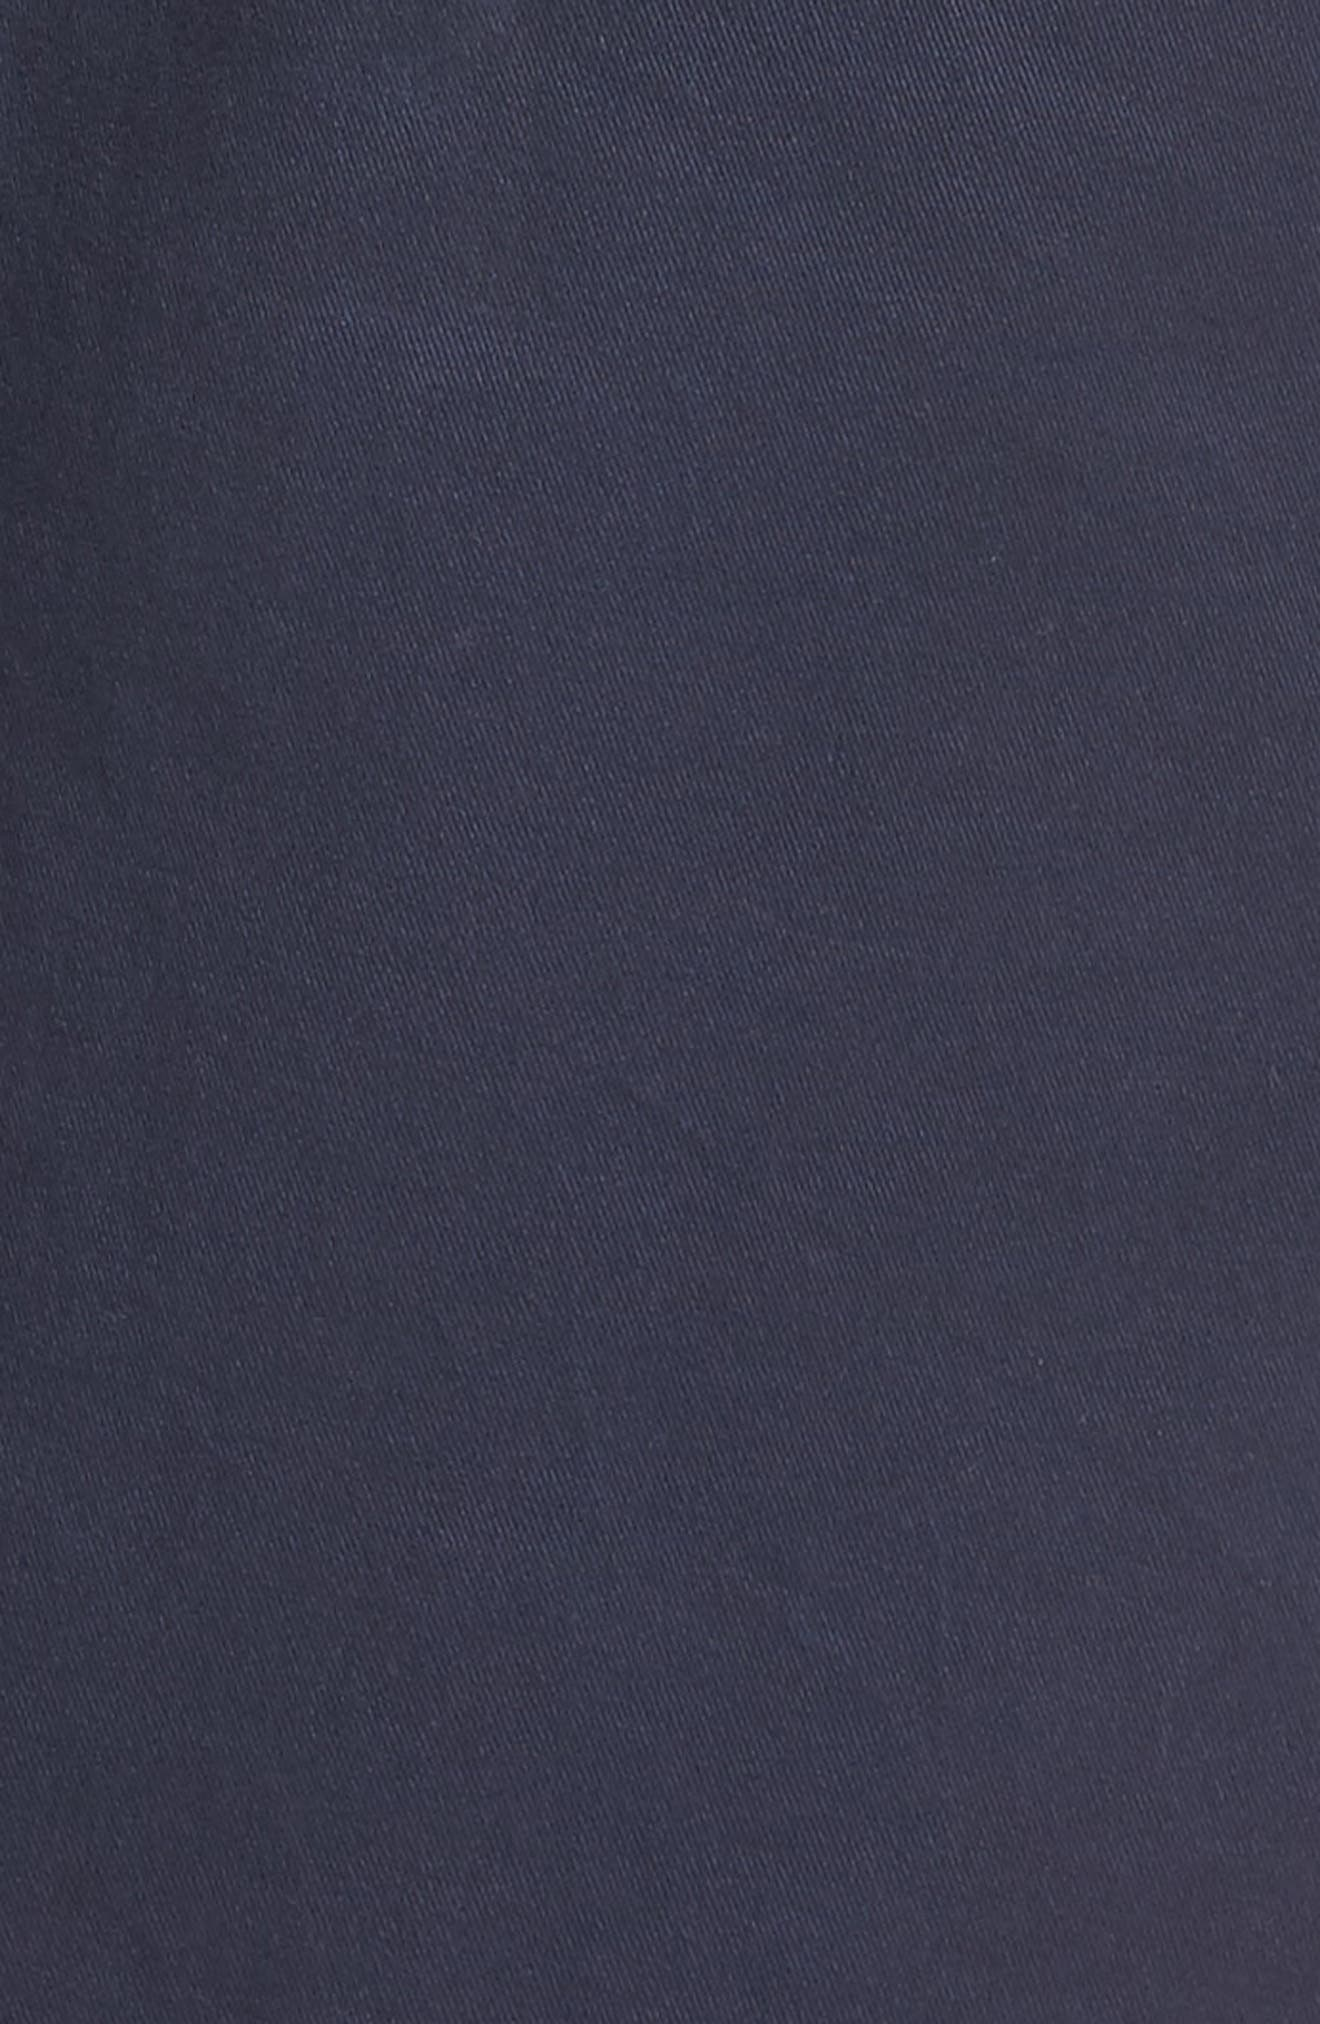 Ballard Slim Fit Stretch Chino 9-Inch Shorts,                             Alternate thumbnail 55, color,